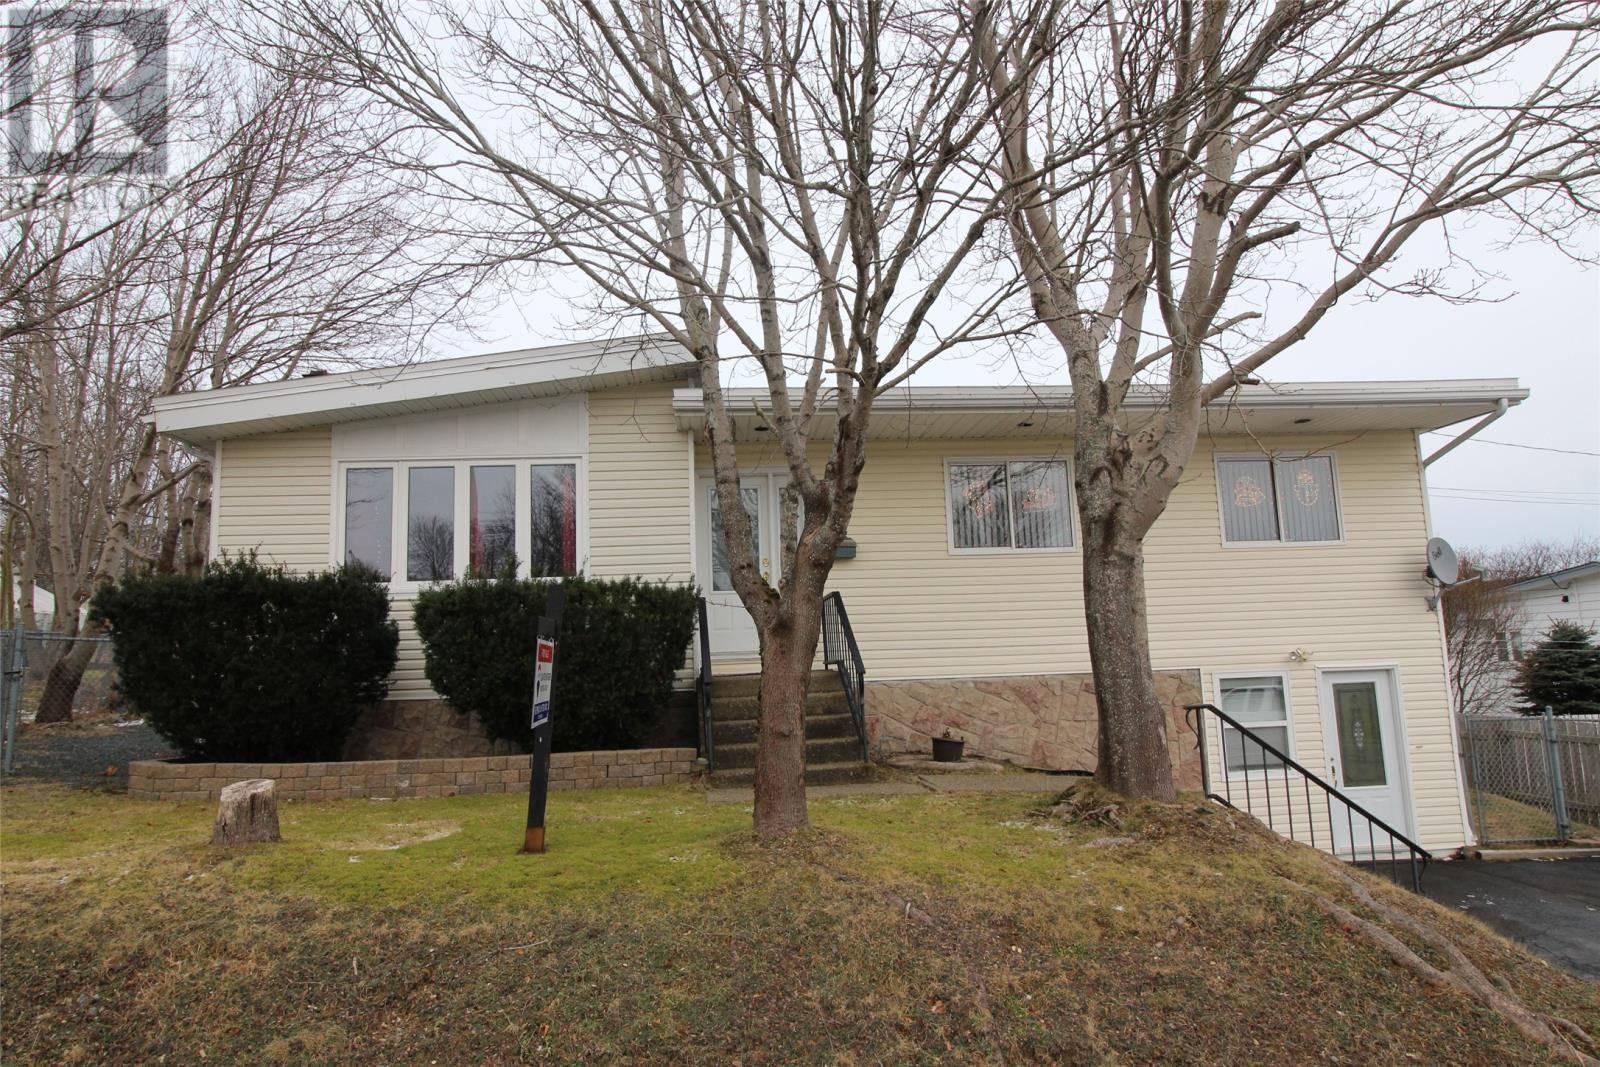 House for sale at 4 Holyrood Pl St. John's Newfoundland - MLS: 1208798